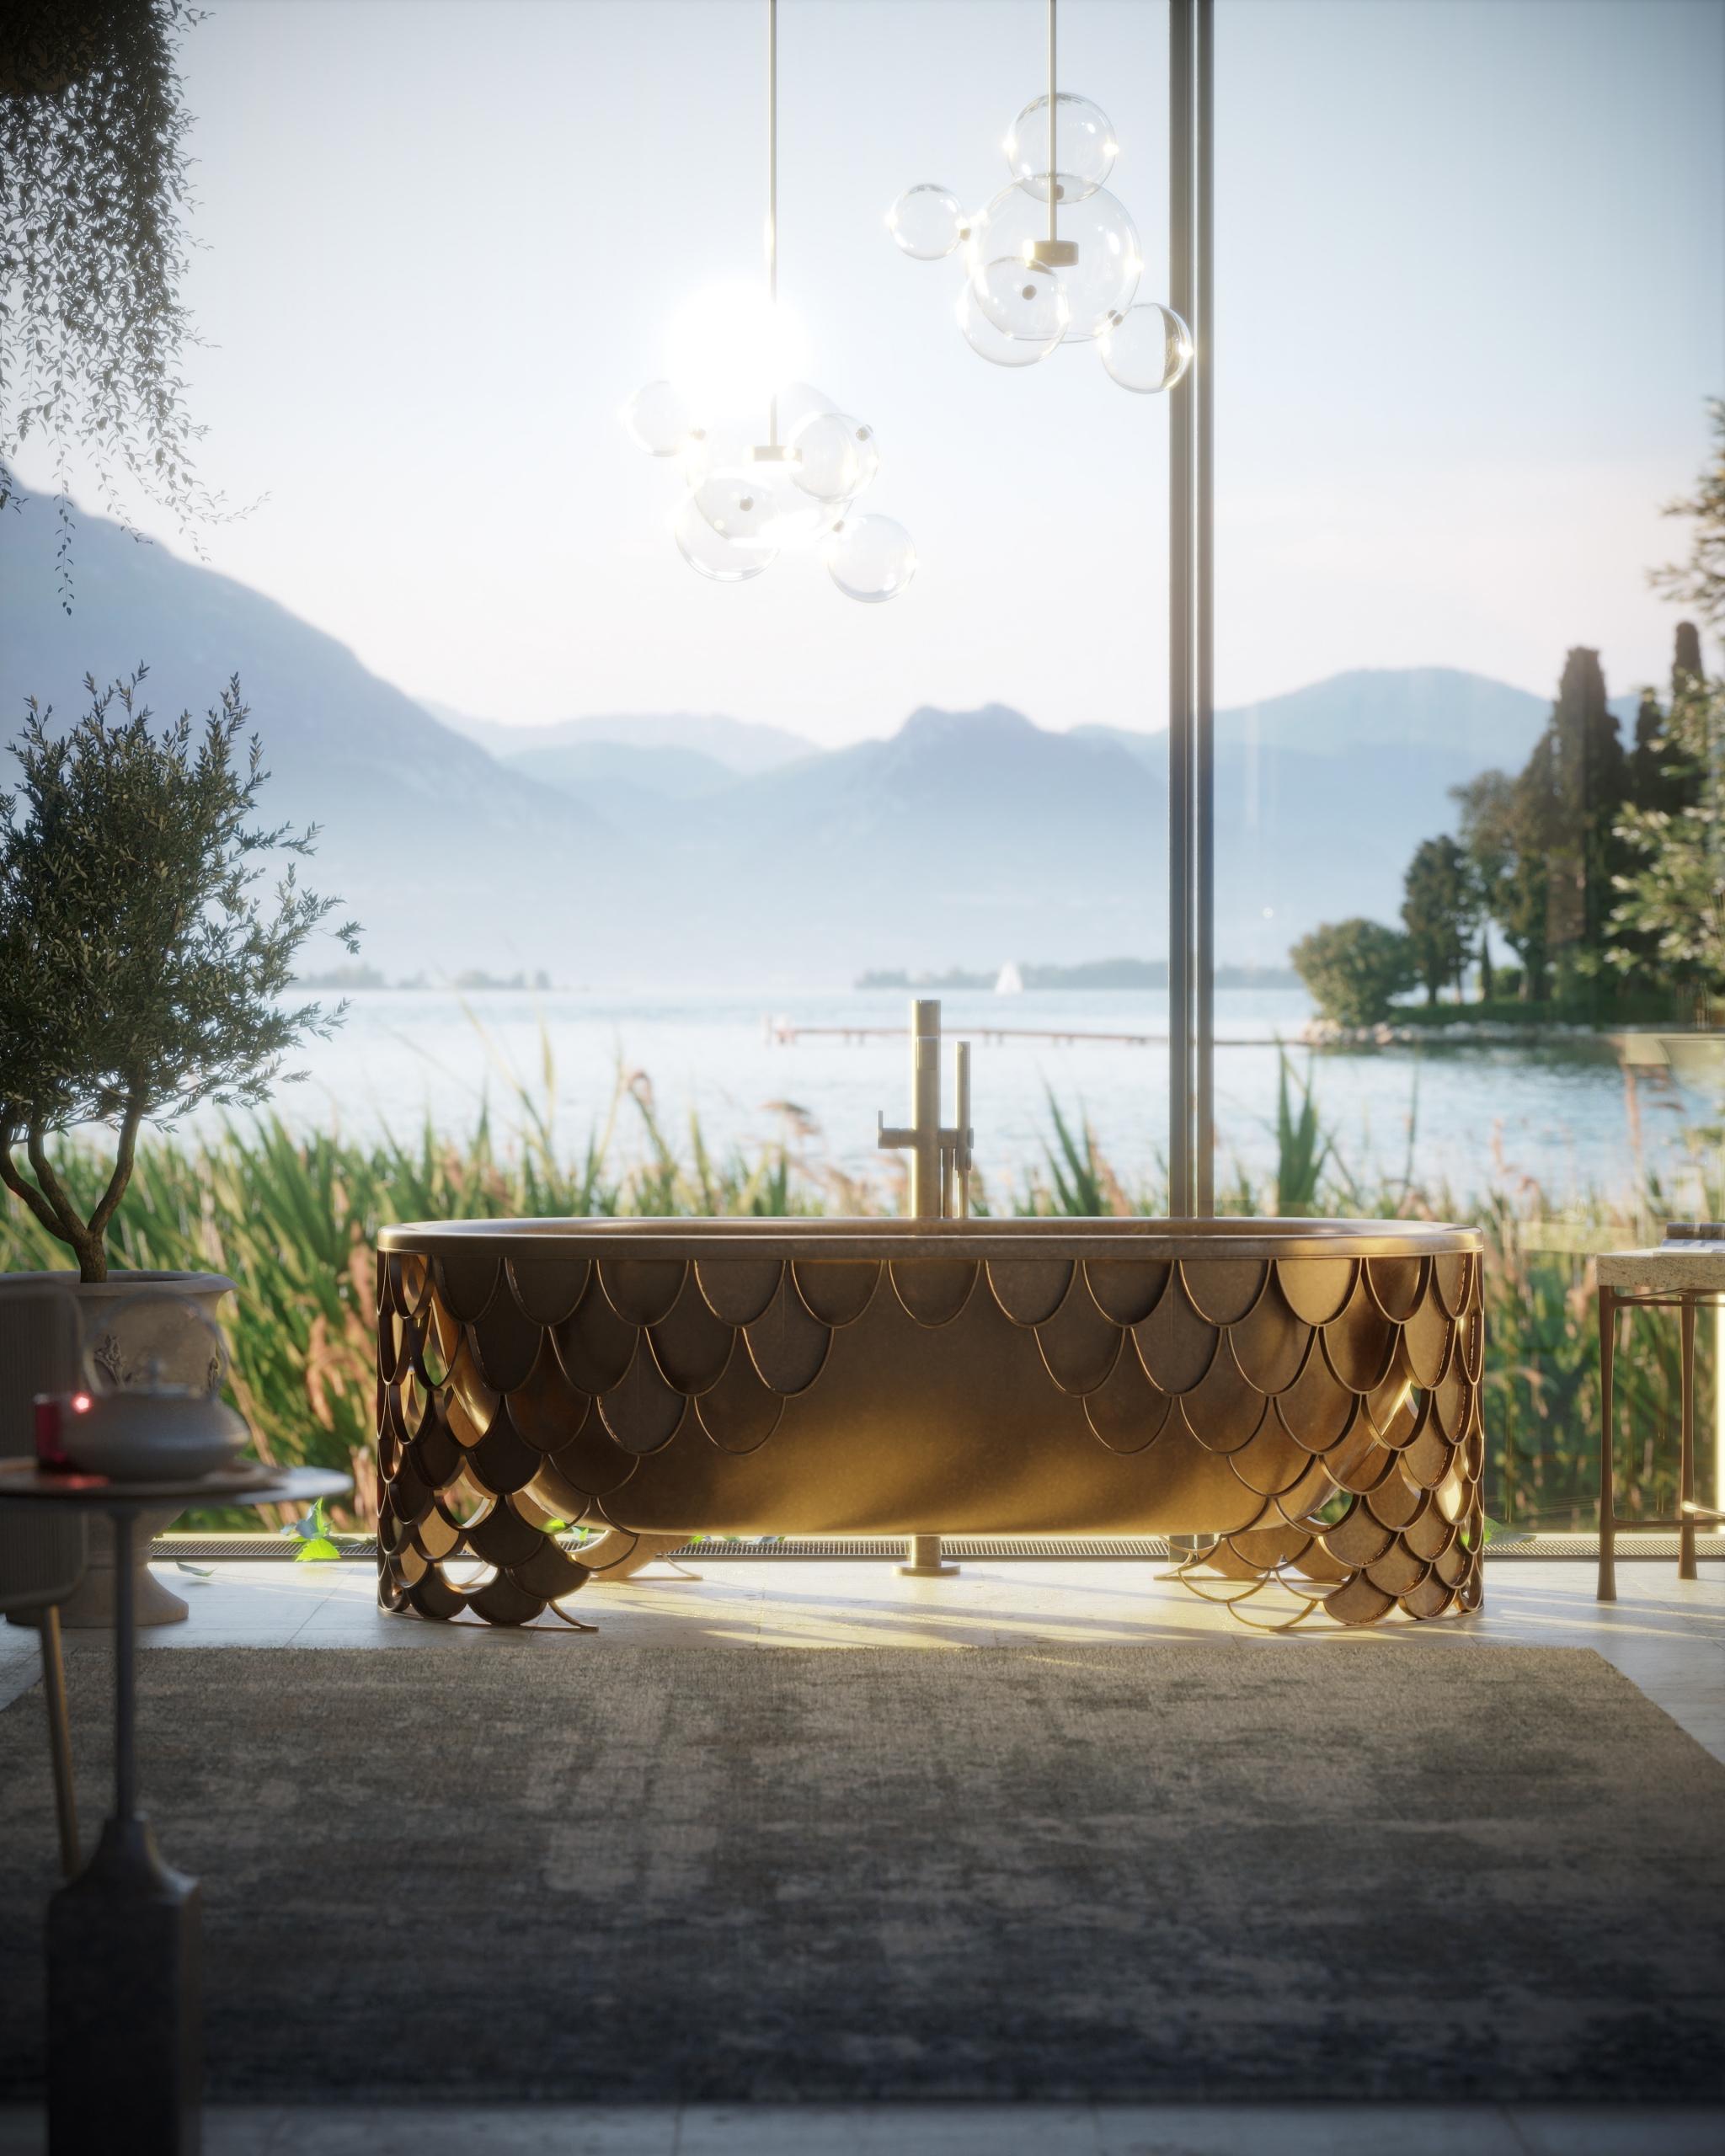 3D Render of a Chich Bathroom Design